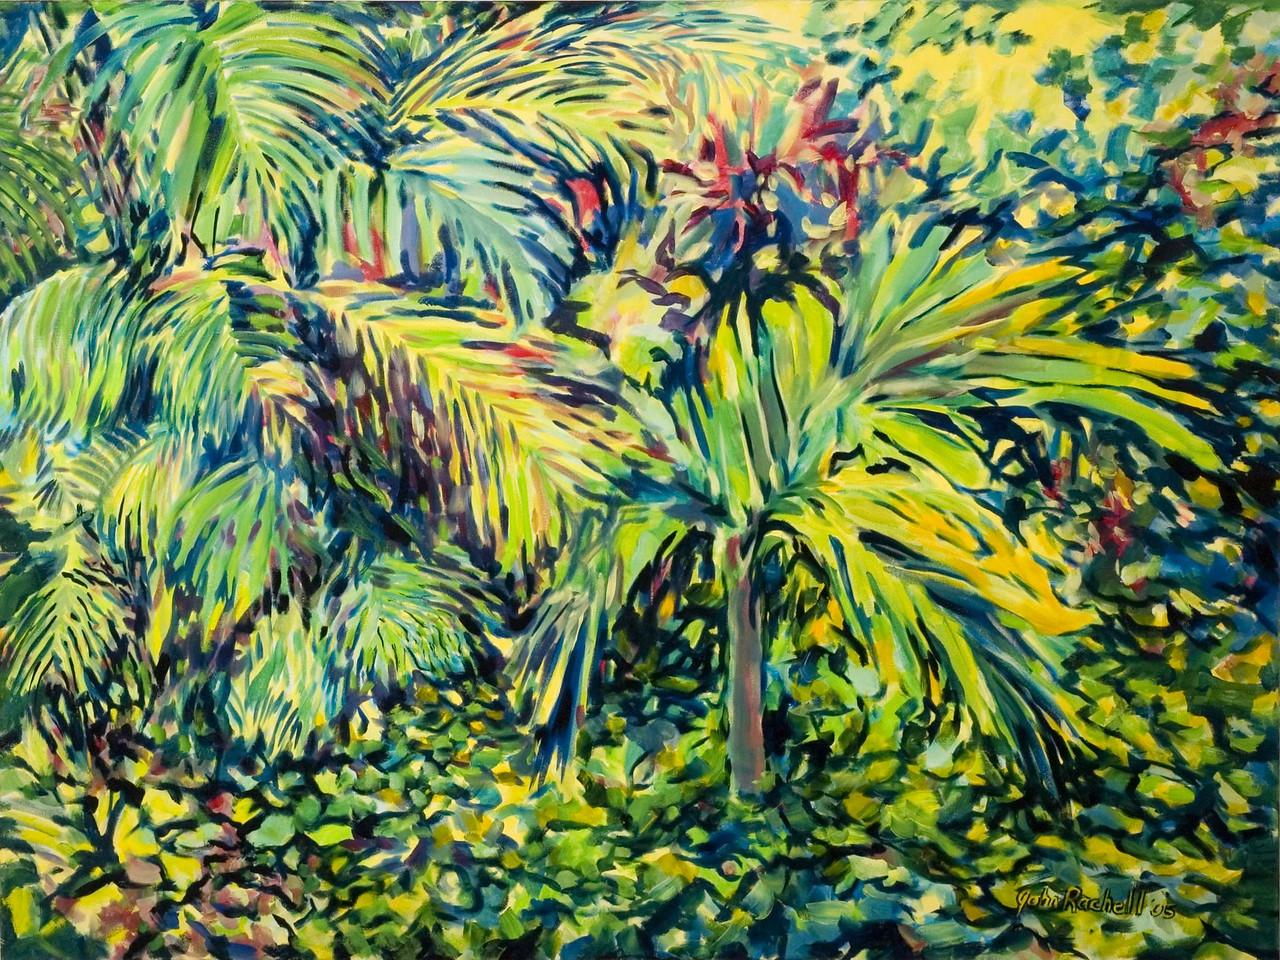 "©John Rachell  Title: The Garden, September 5, 2005 Image: 48""w X 36""d Dated: 2005 Medium & Support: Oil paint on canvas Signed: LR Signature"